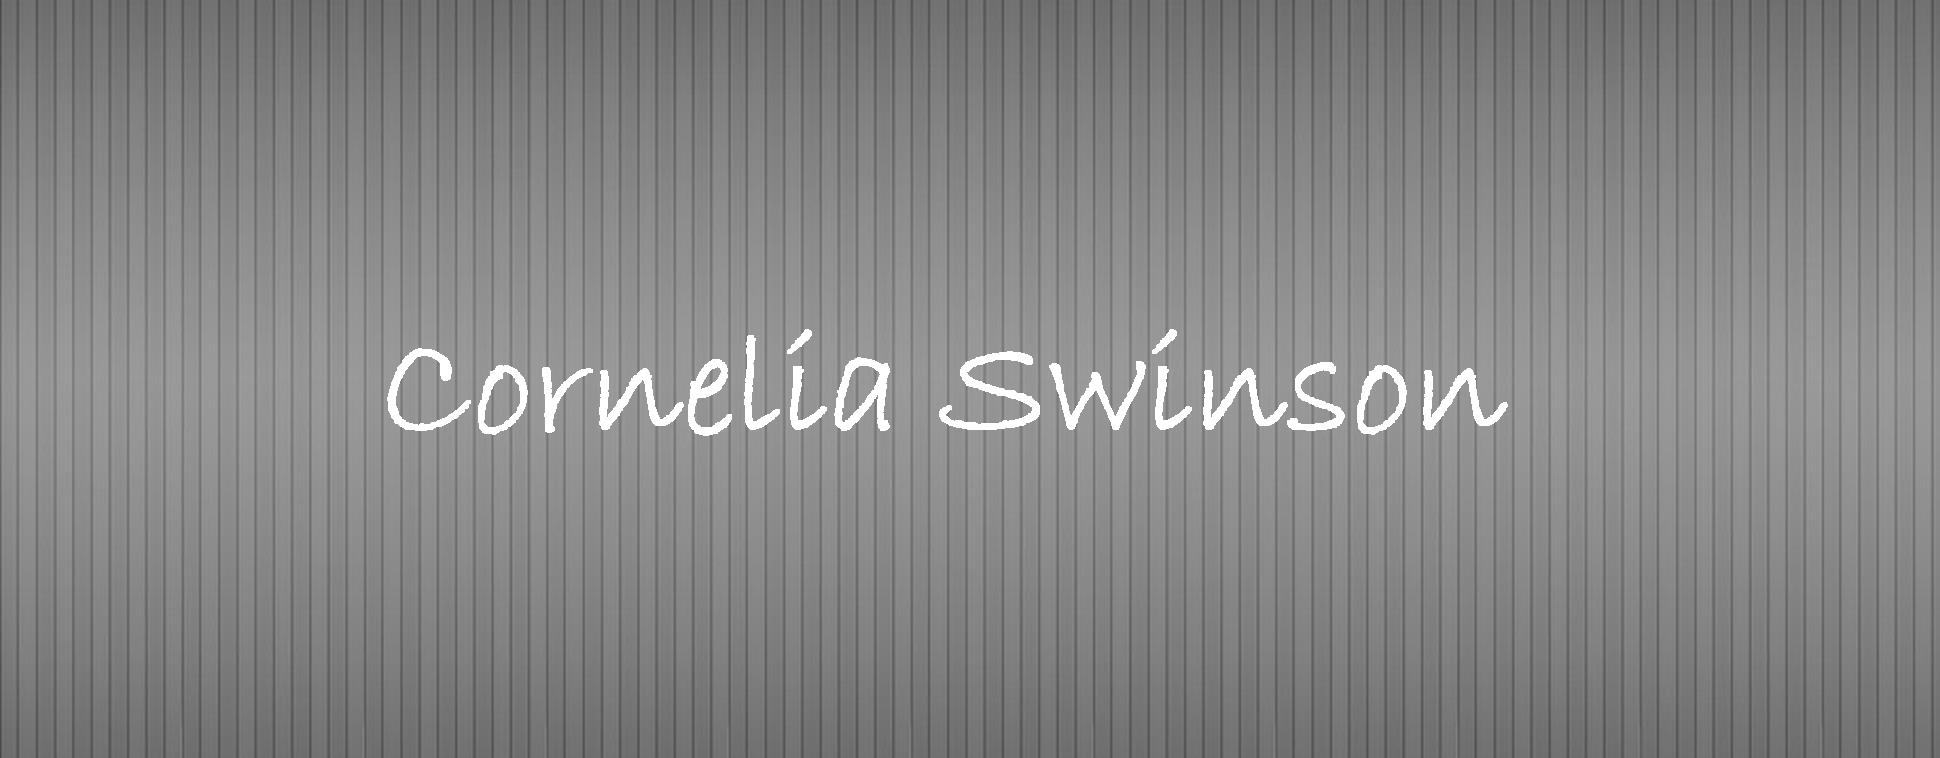 Cornelia Swinson.jpg